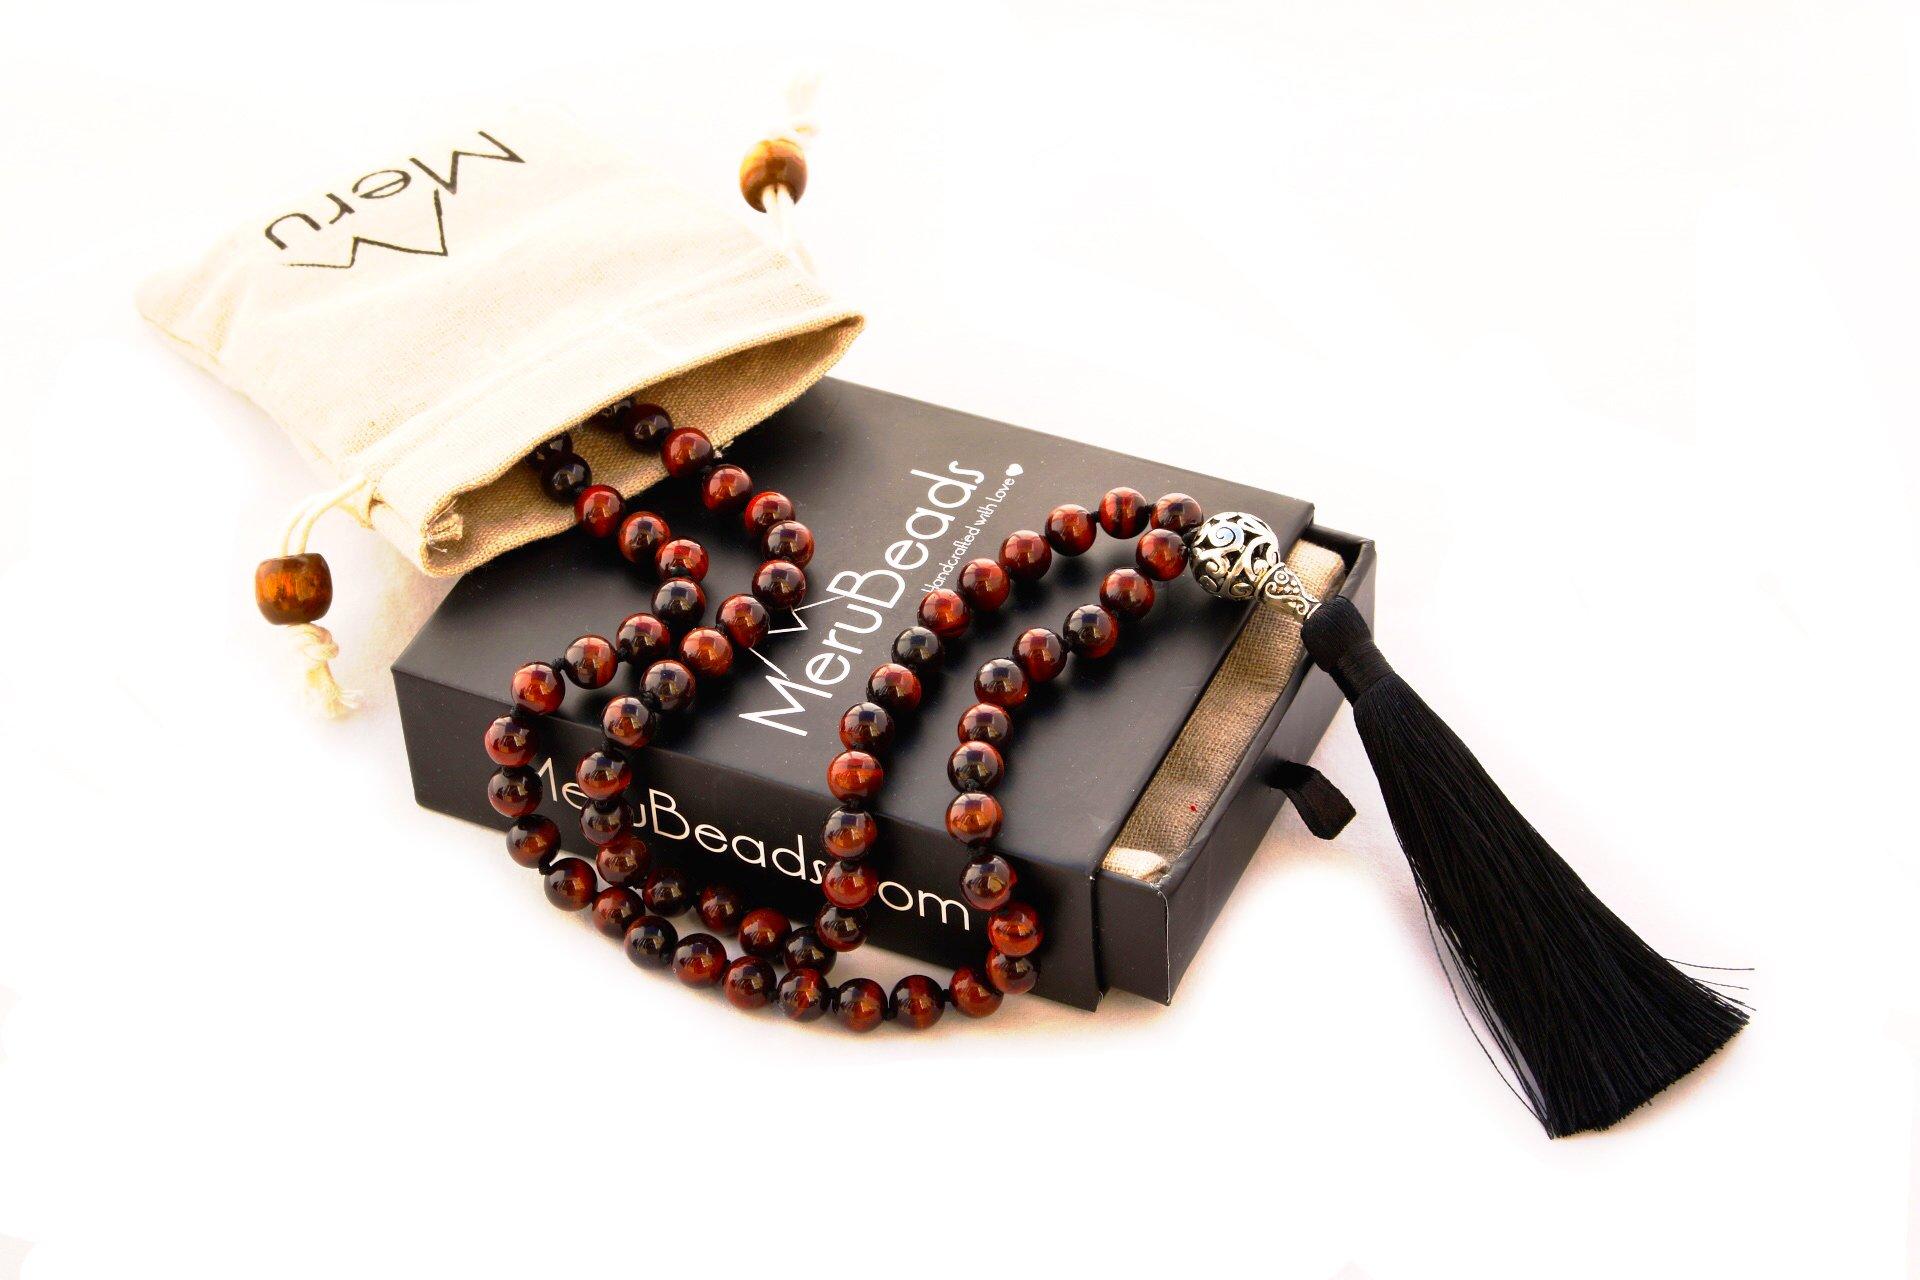 Premium Exotic Tiger Eye RED Mala Beads Necklace - Japa Mala - Buddha Necklace - Tigers Eye Necklace - Buddhist Prayer Beads - Tassel Necklace - 108 Mala Beads Meditation - Meru Beads Necklace